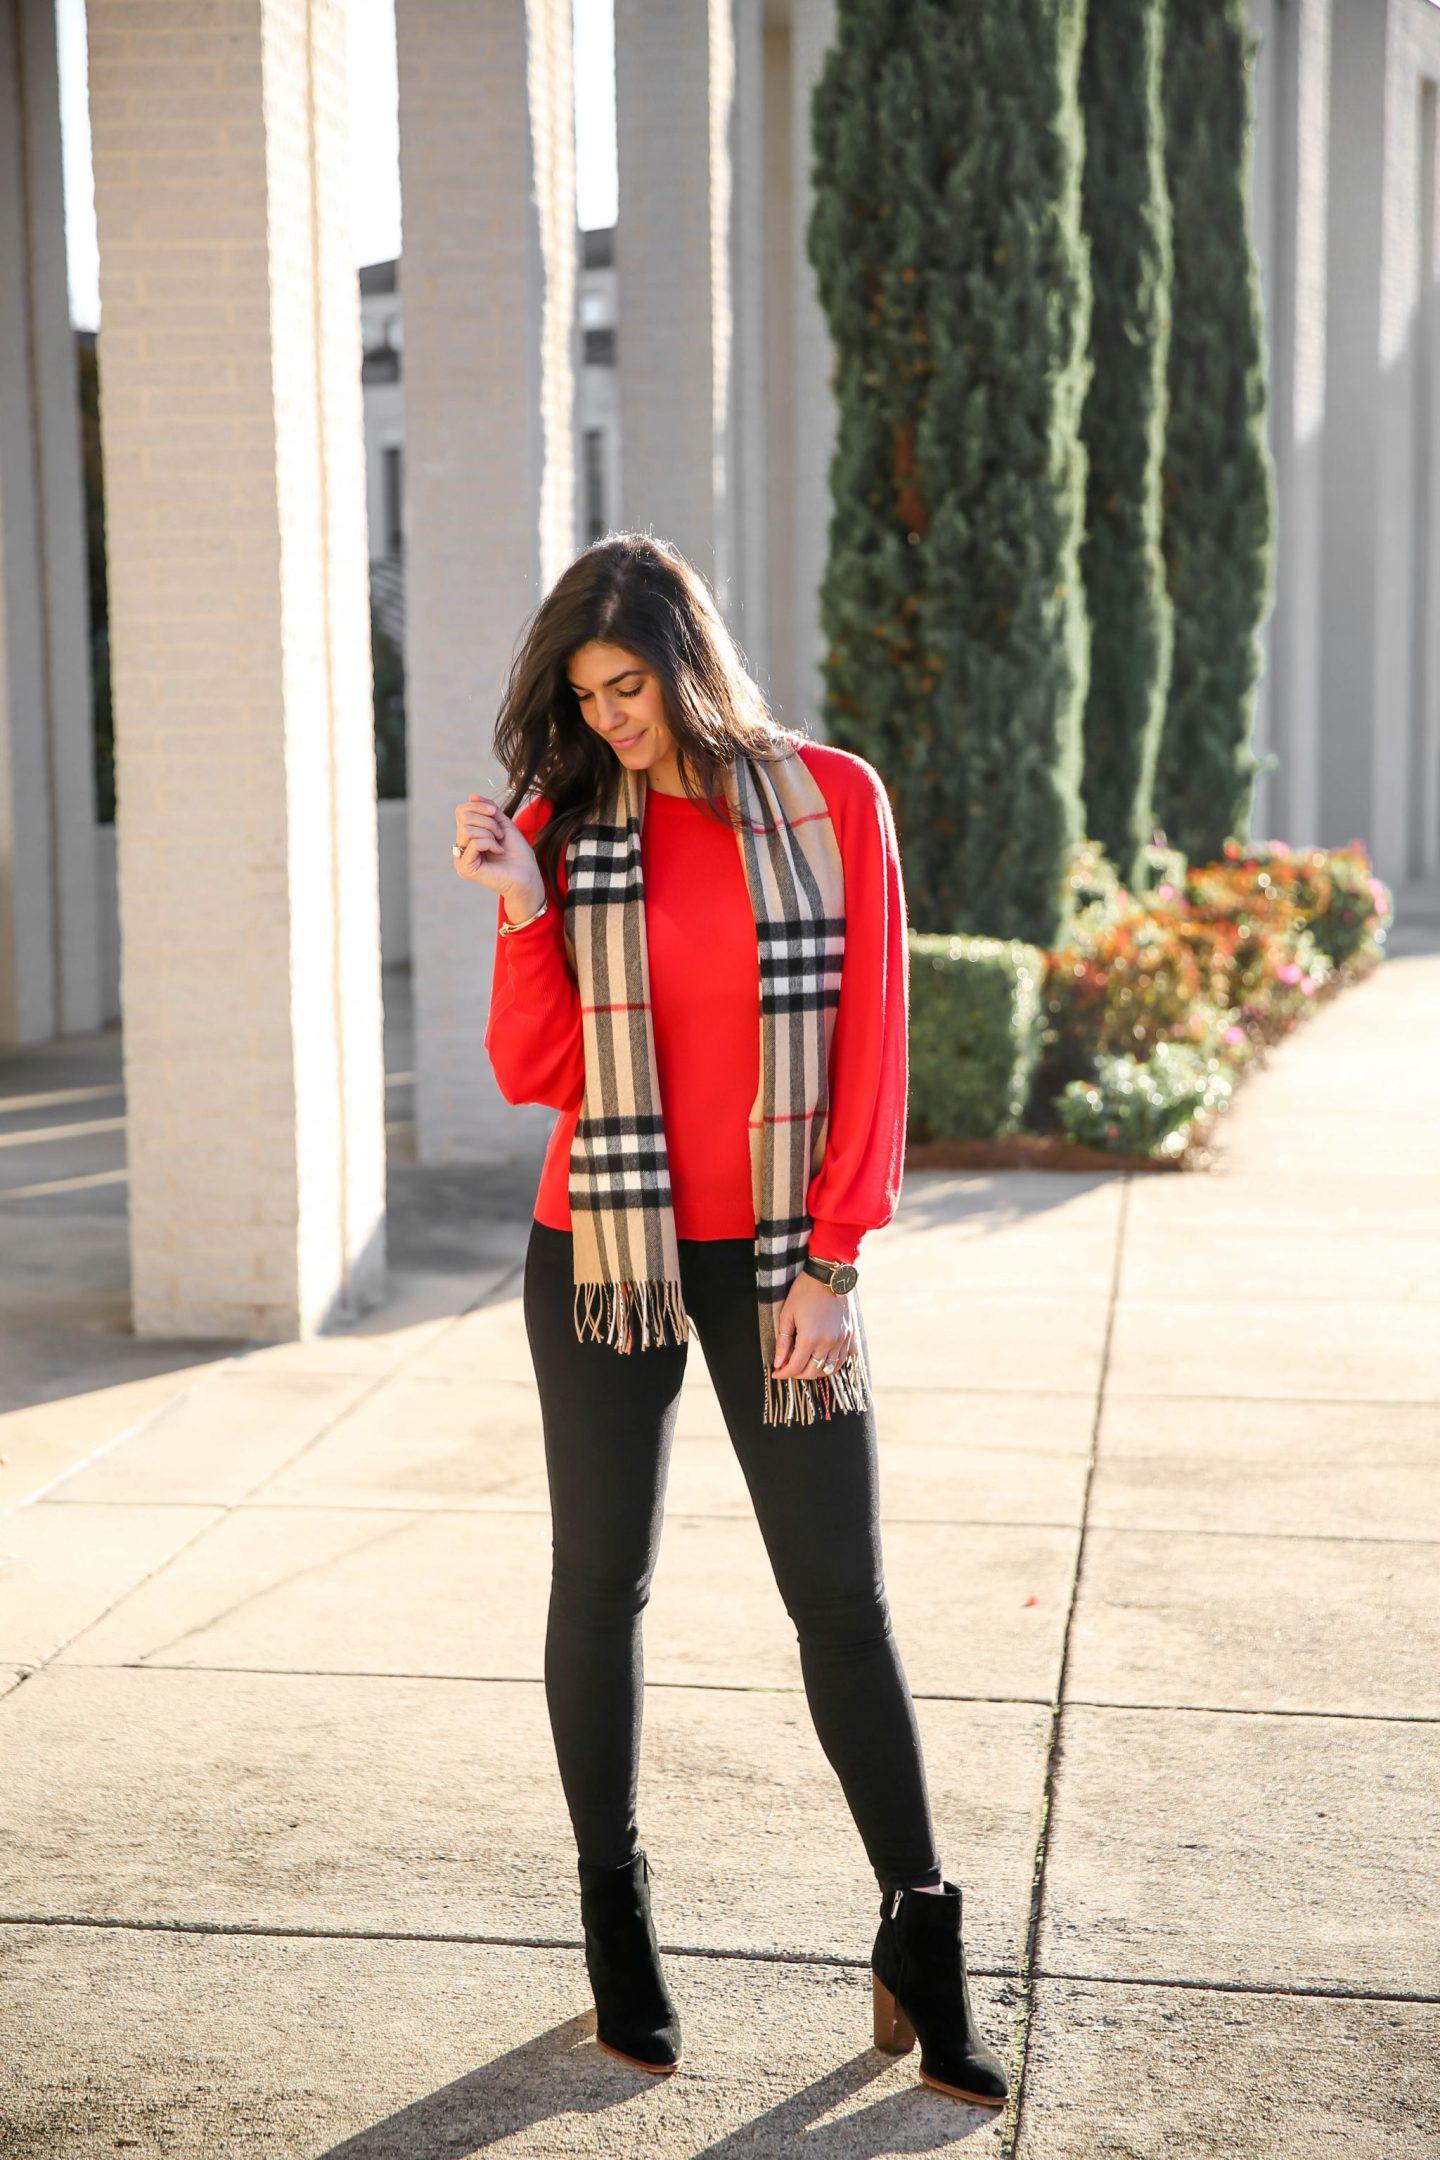 clients to cocktails - casual chic workwear - Lauren Schwaiger style blog